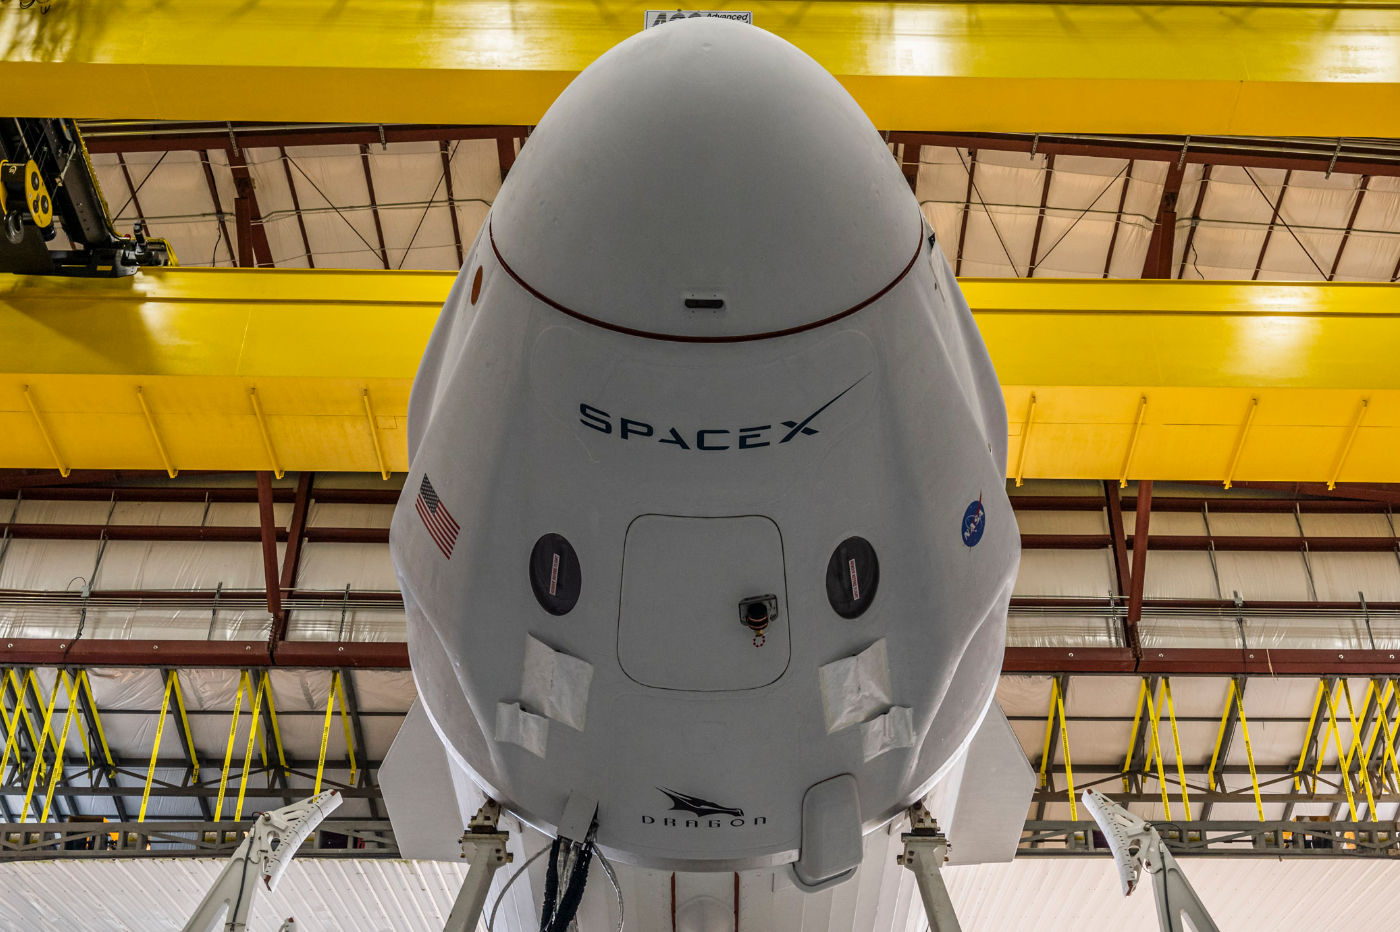 Dragon SpaceX crew